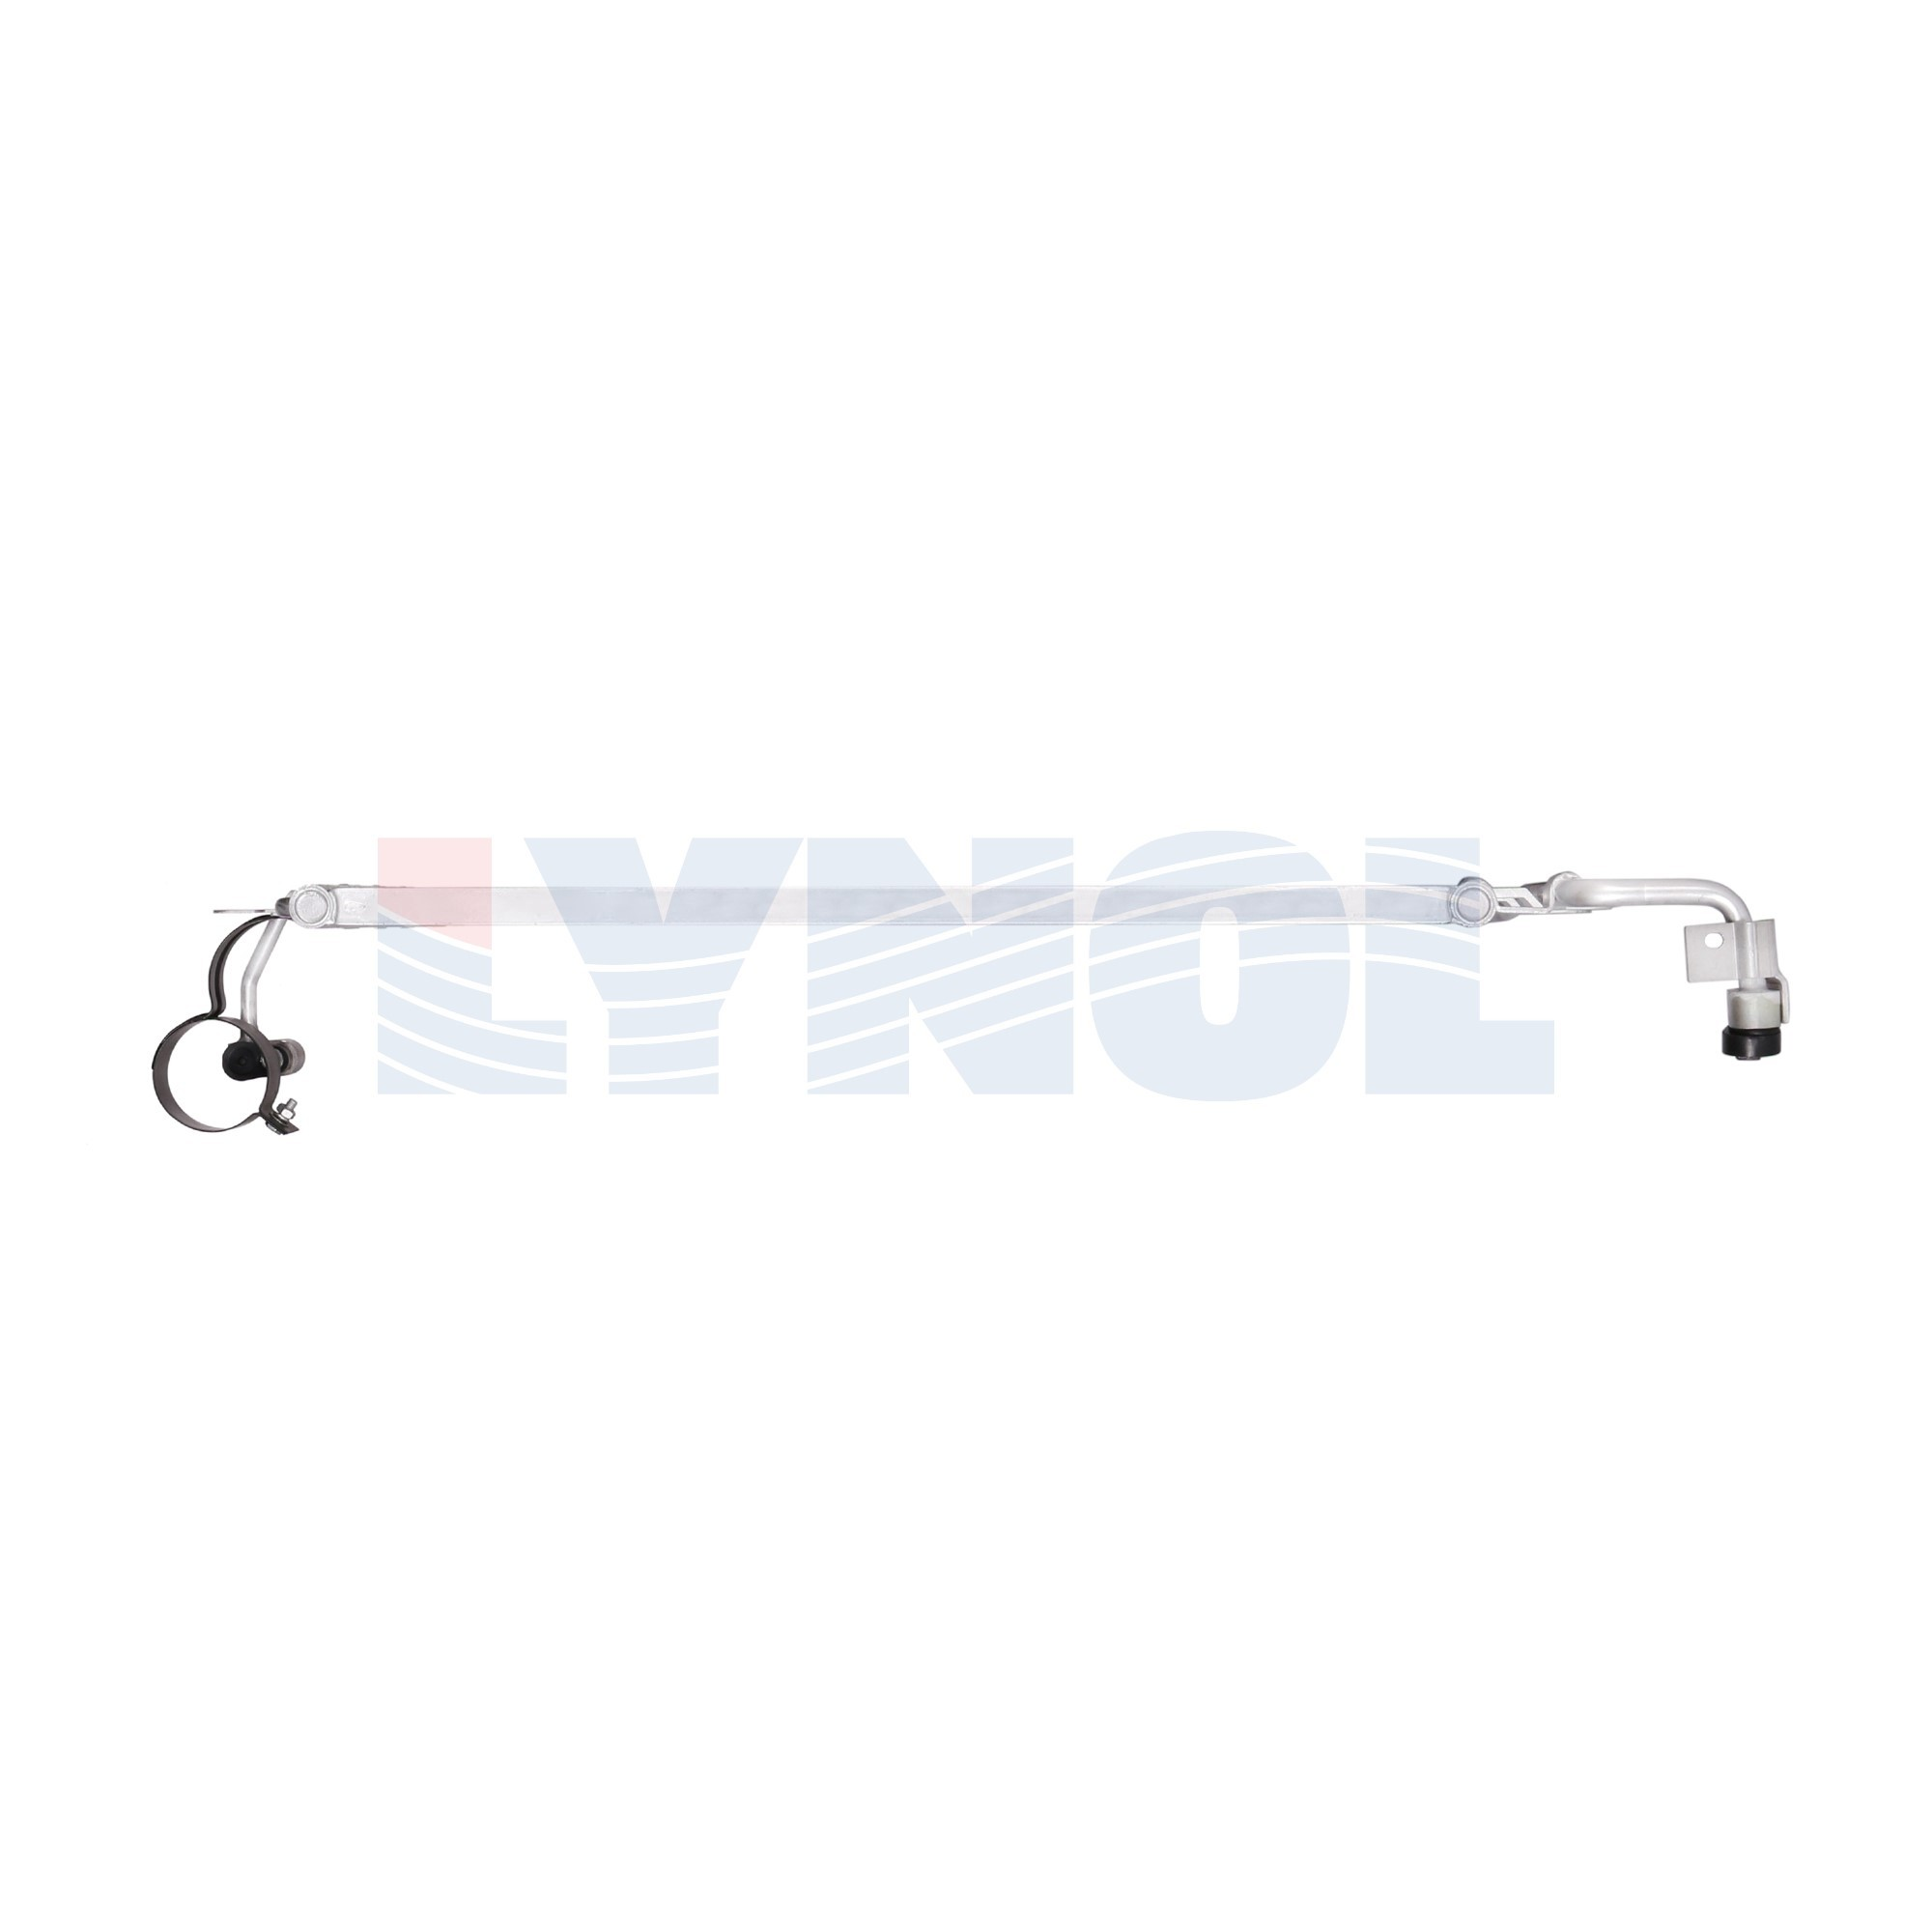 Lynol Truck Parts Gt Automotive A C Condenser Gt Ac